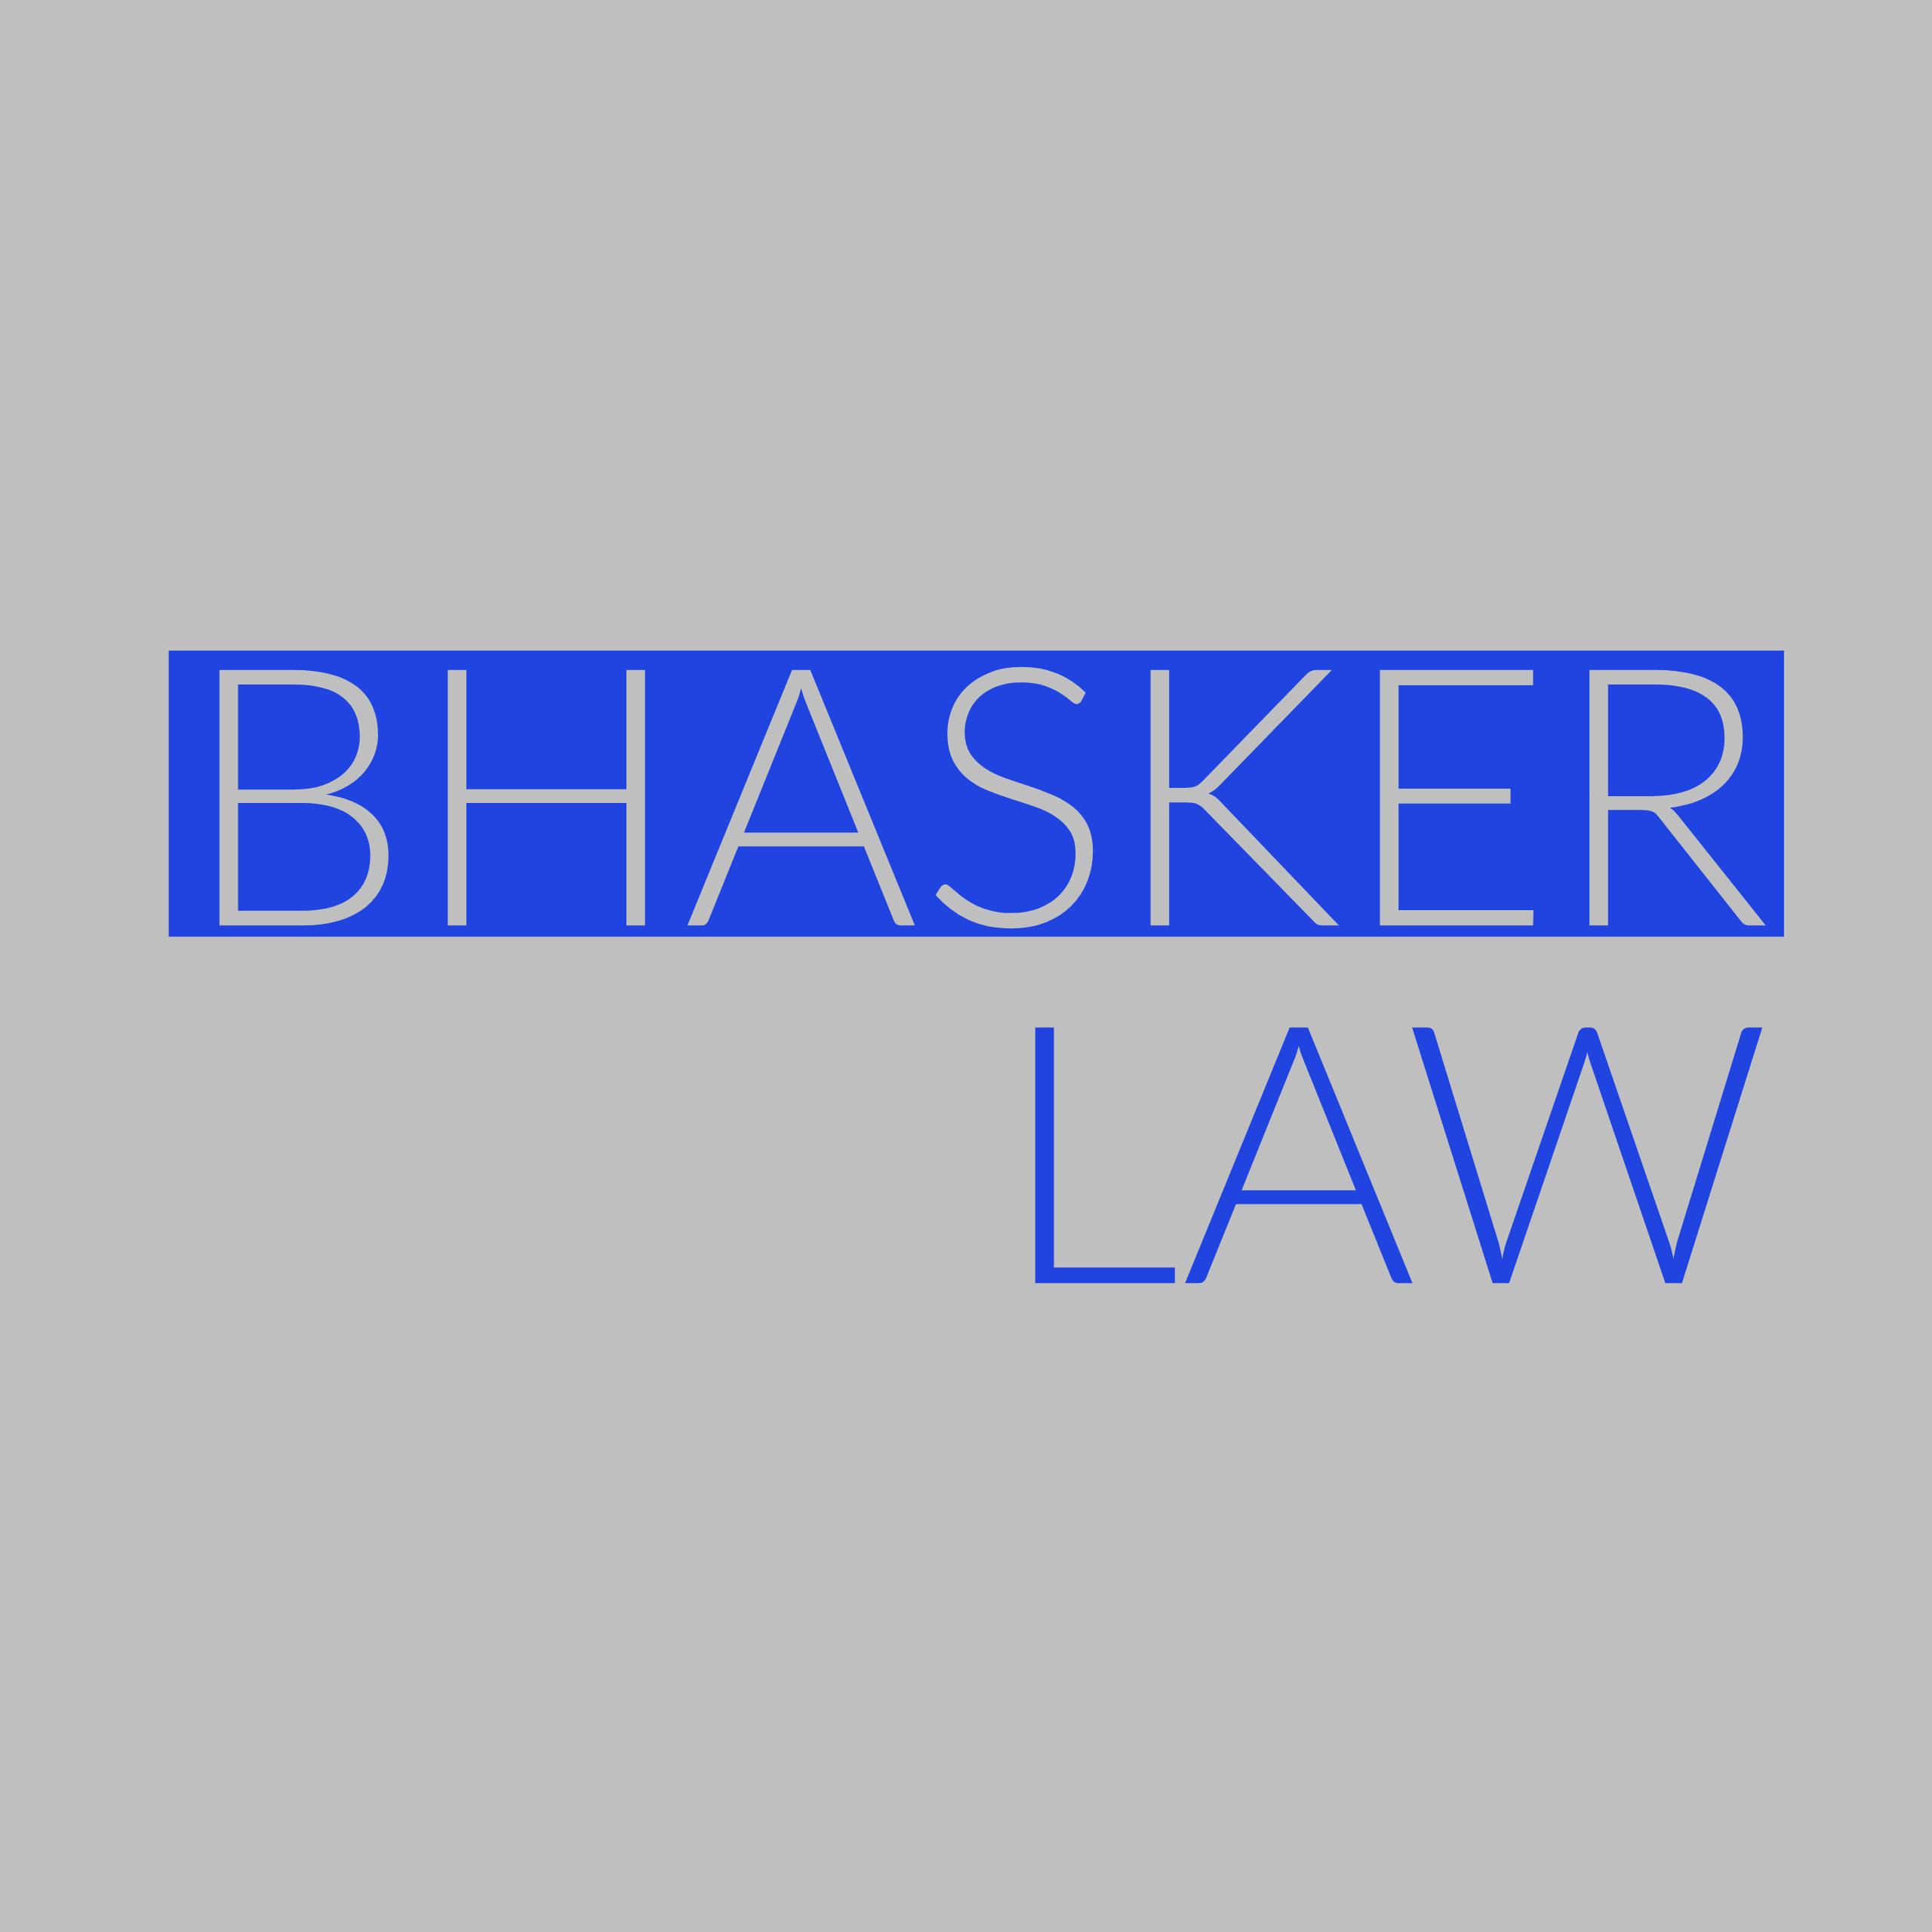 Kedar Bhasker